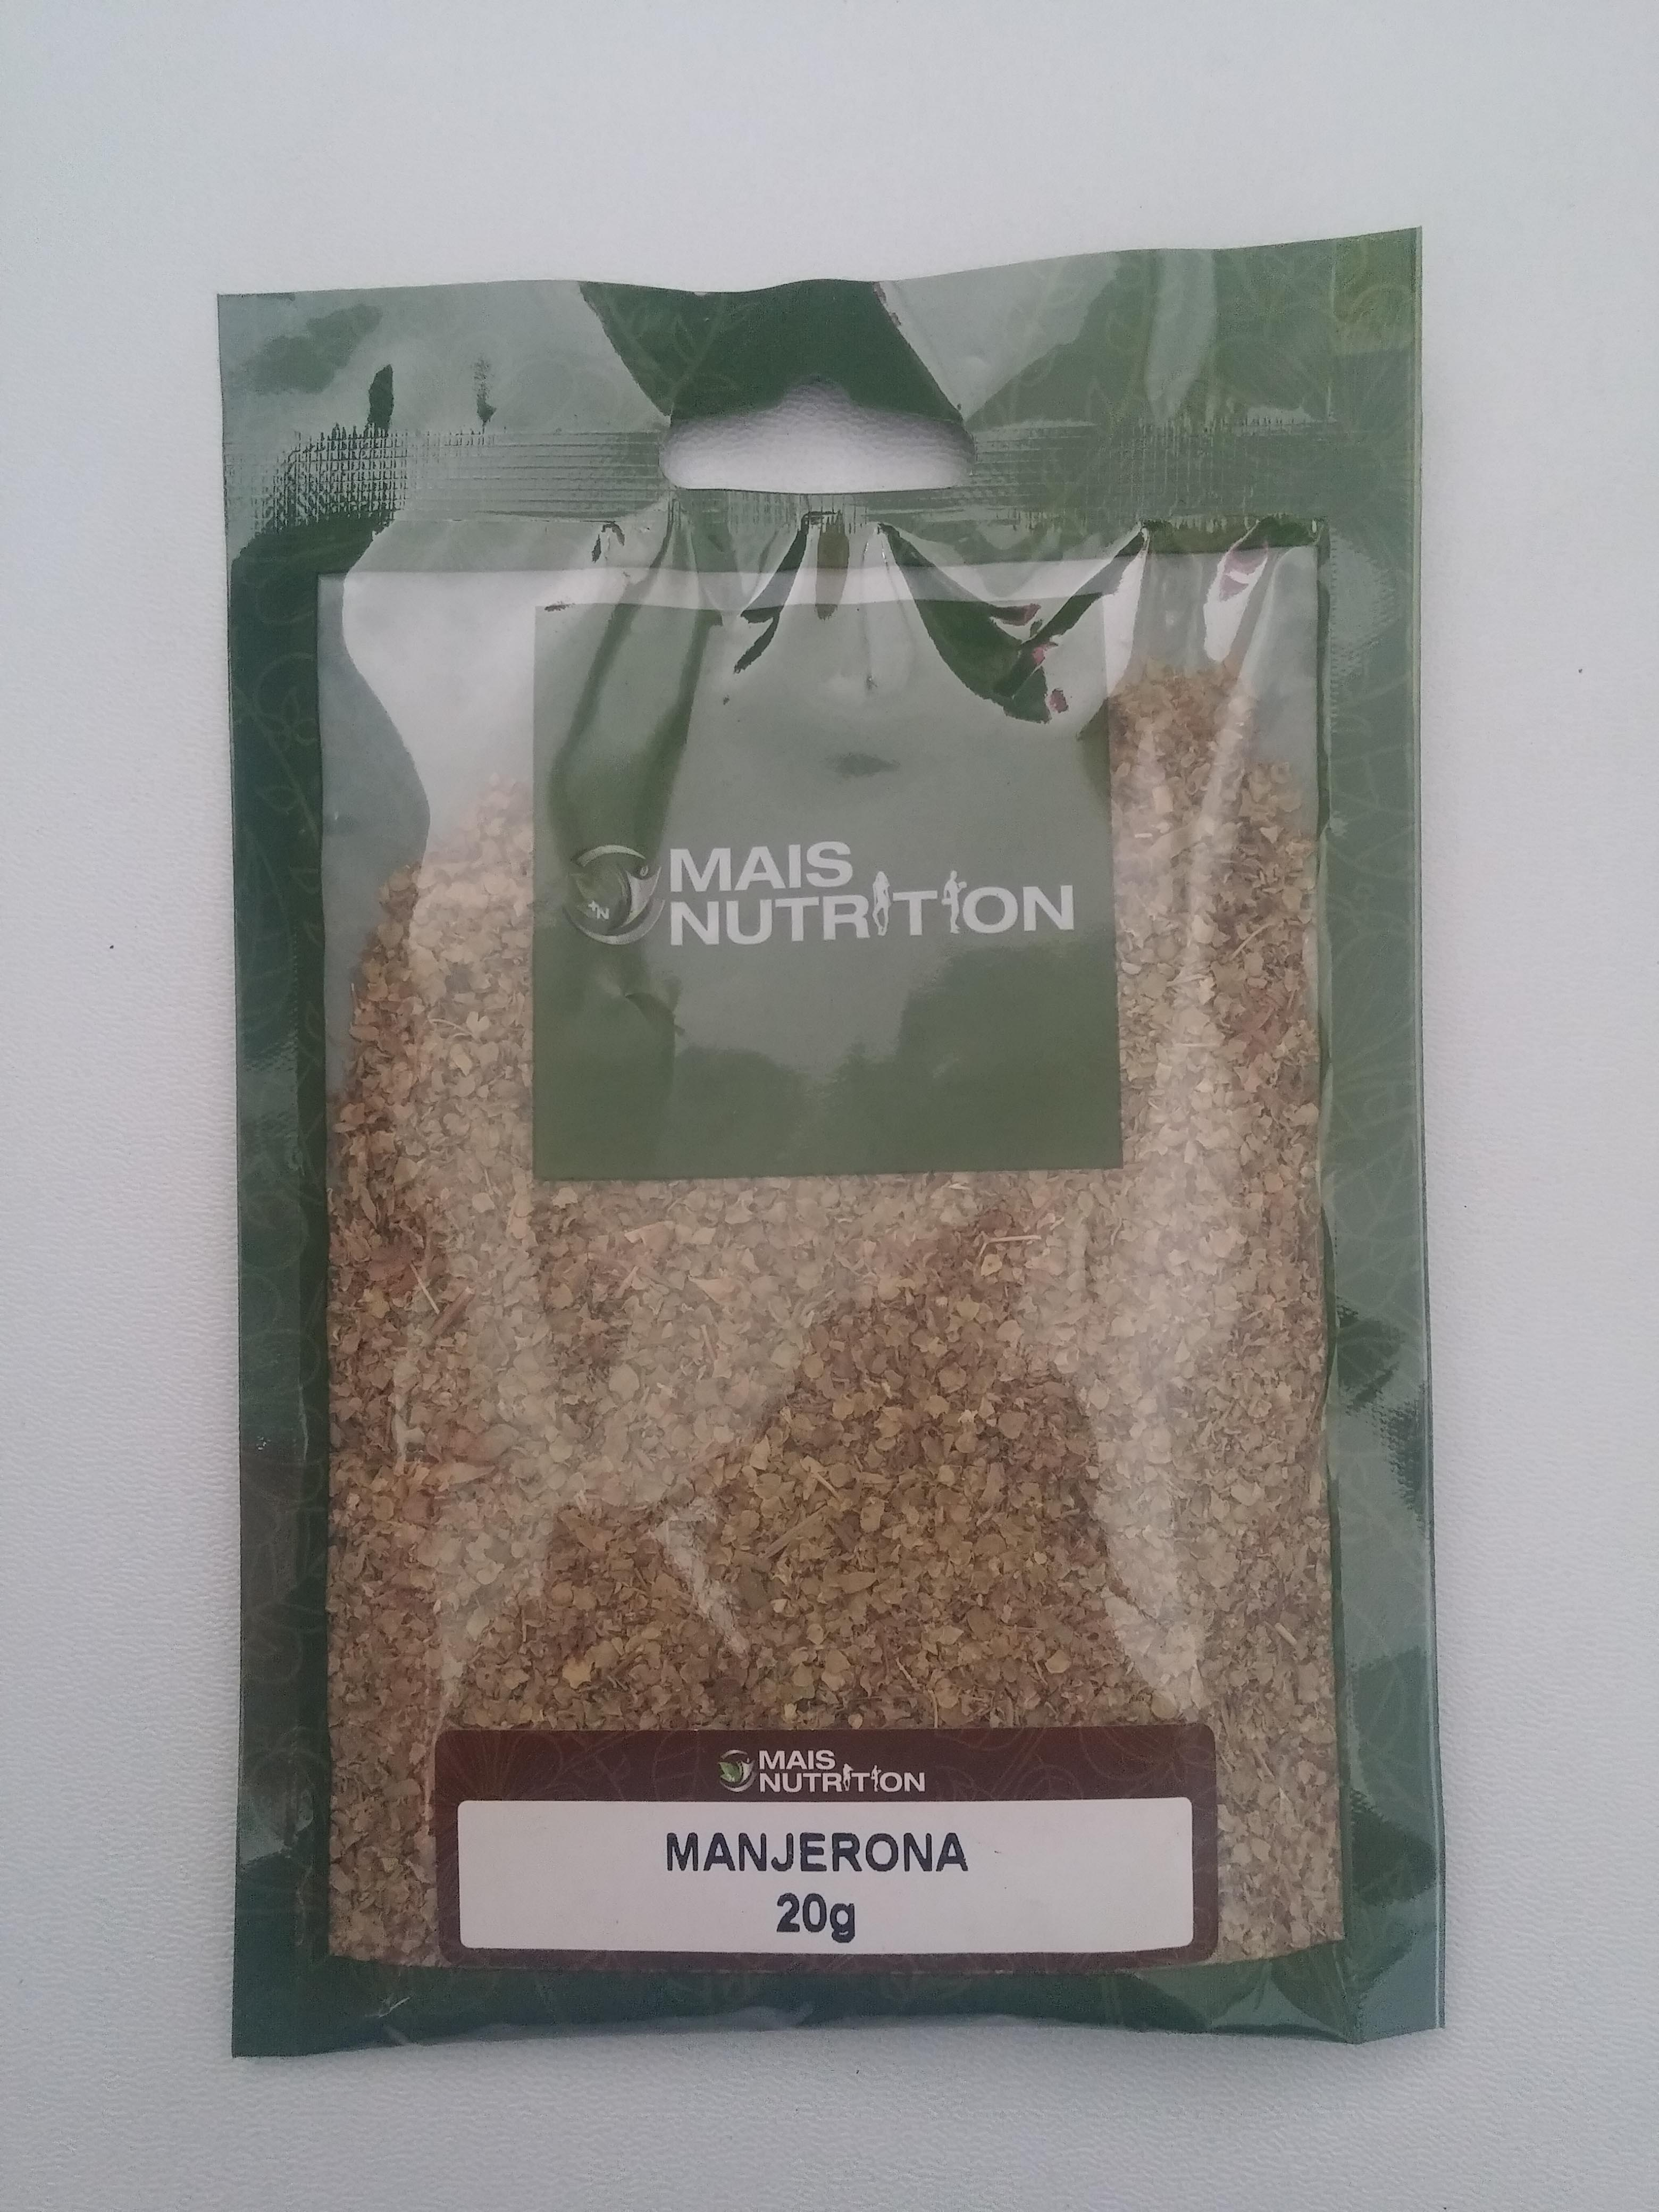 Manjerona 20g - Mais Nutrition